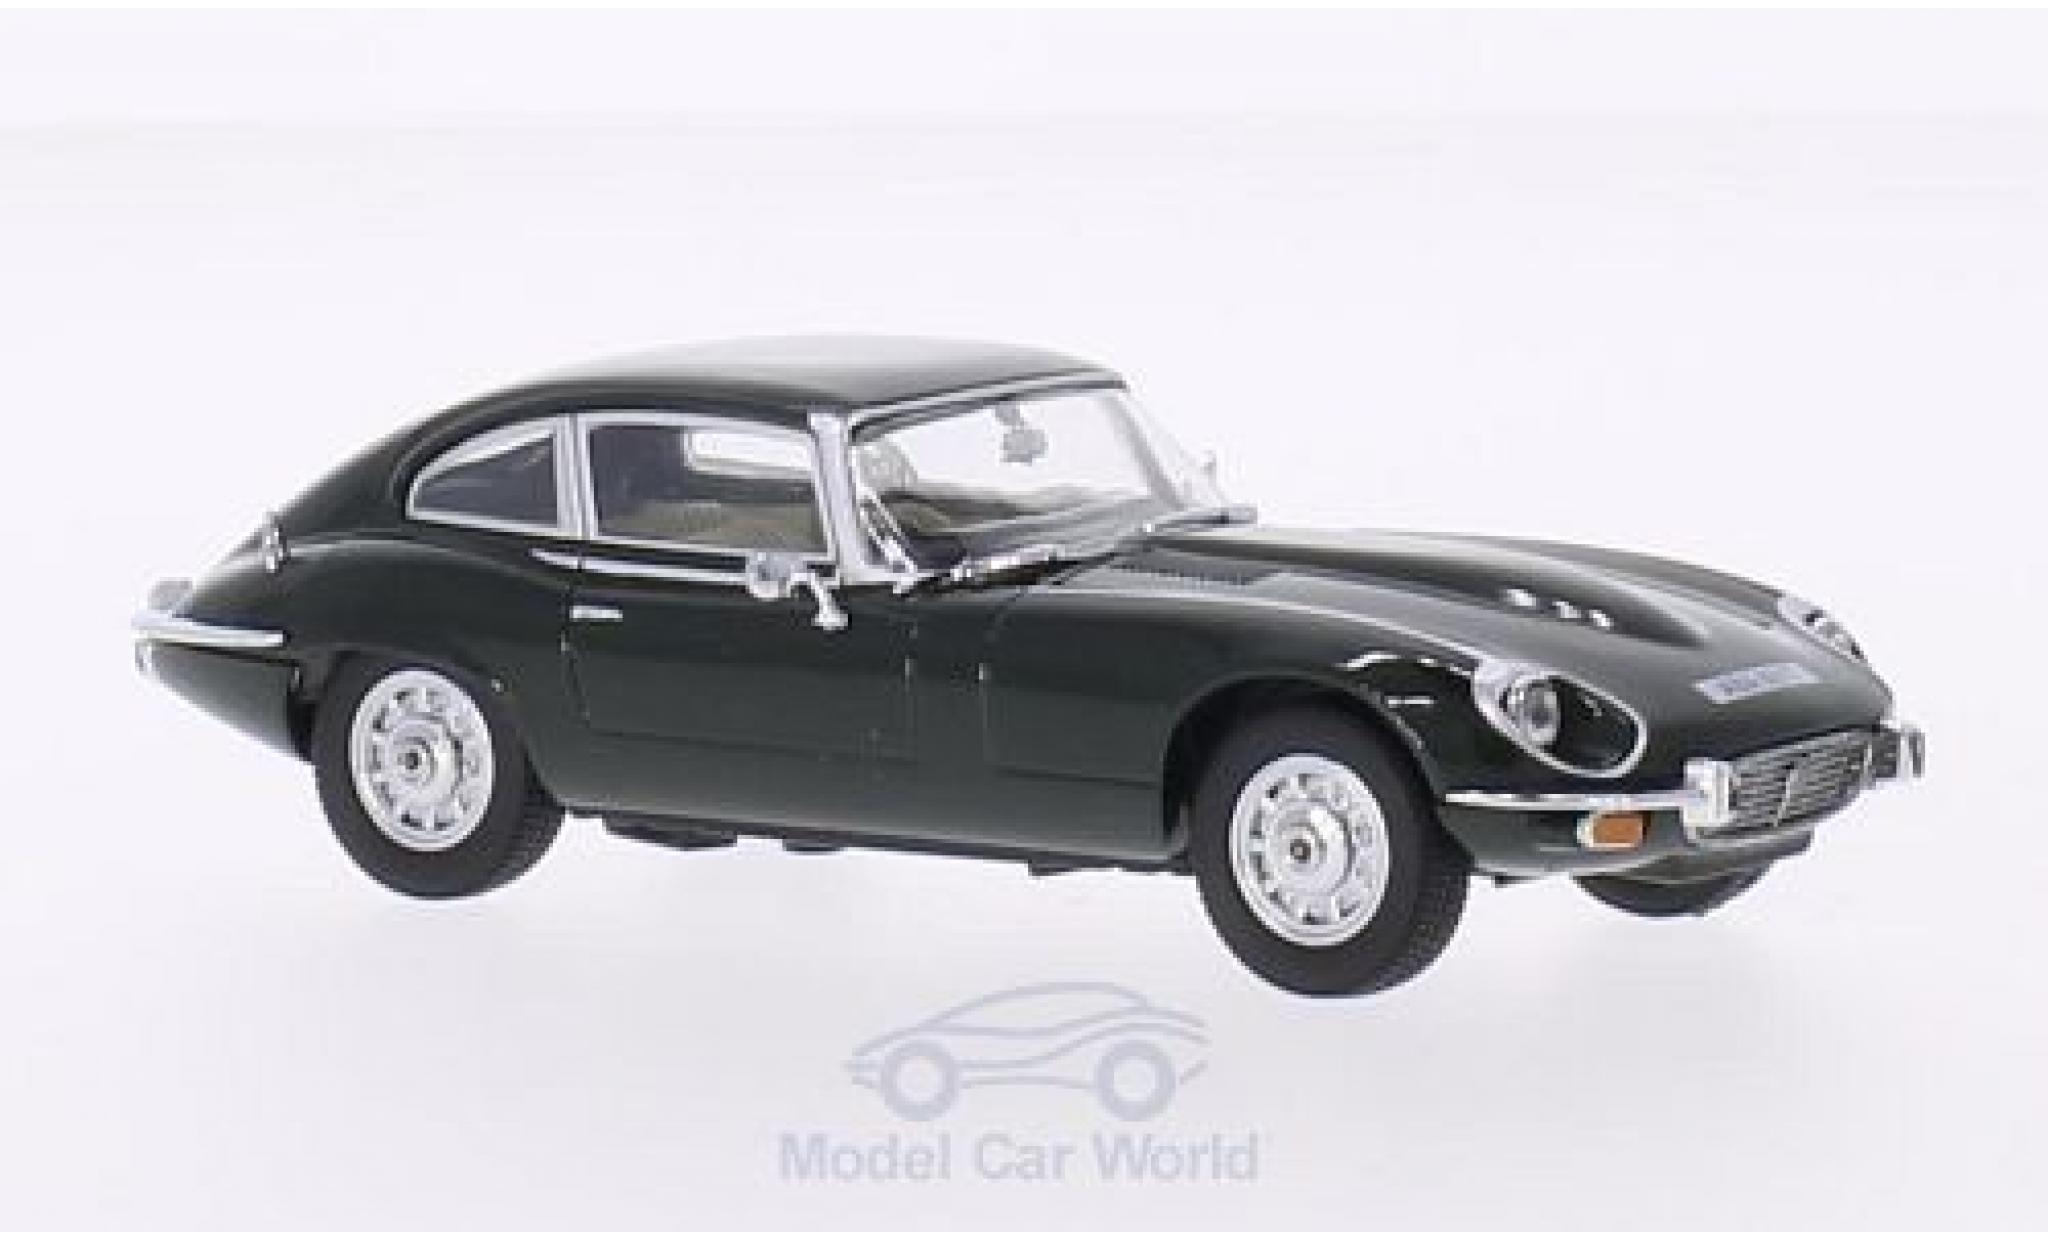 Jaguar E-Type 1/43 Oxford V12 Coupe verte RHD